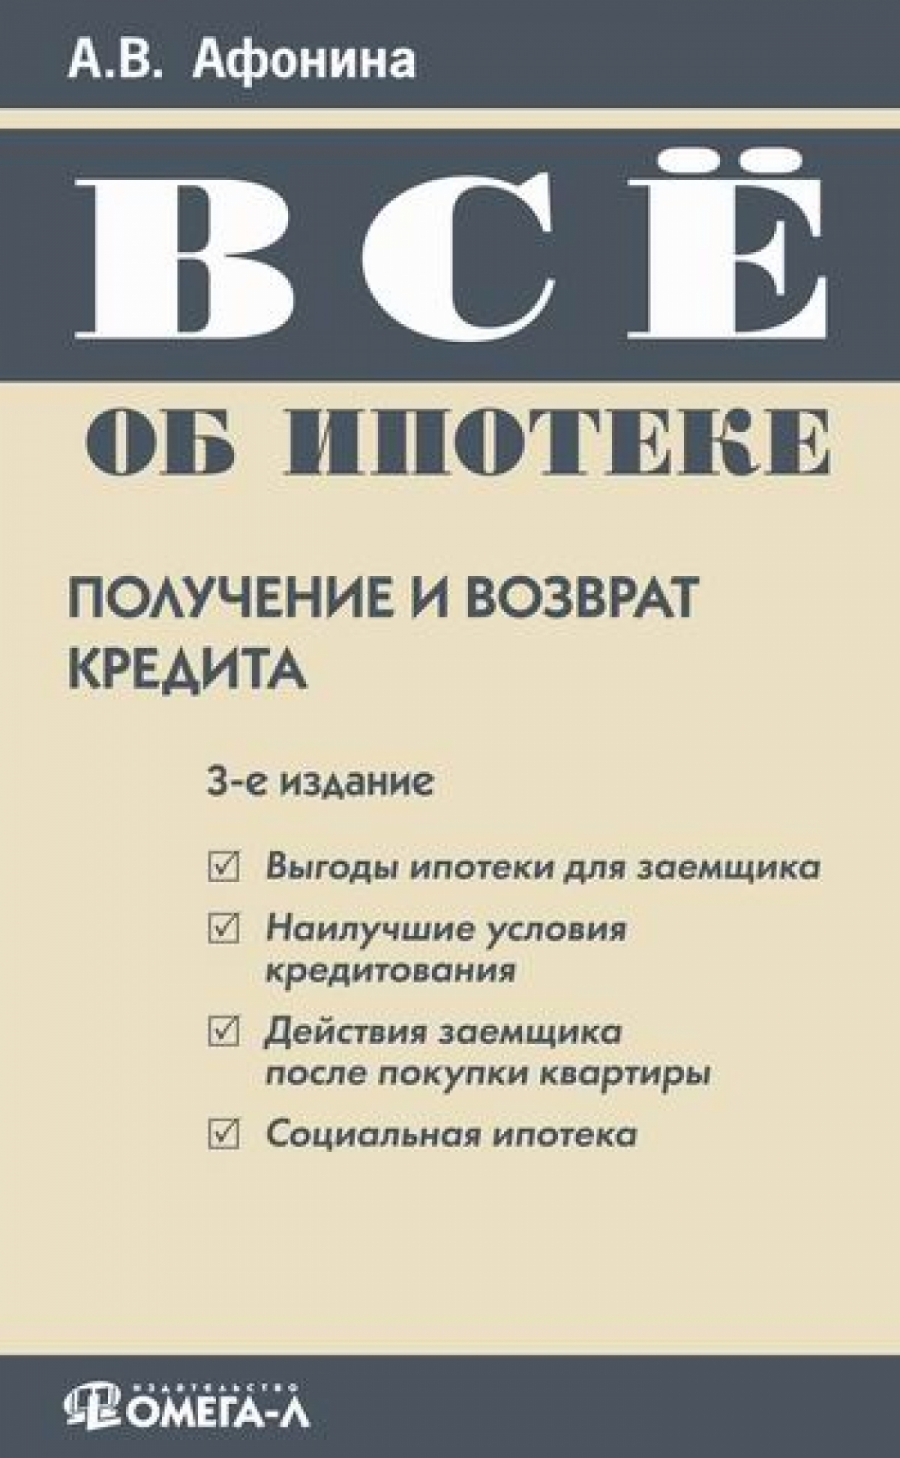 Обложка книги:  афонина а.в - все об ипотеке